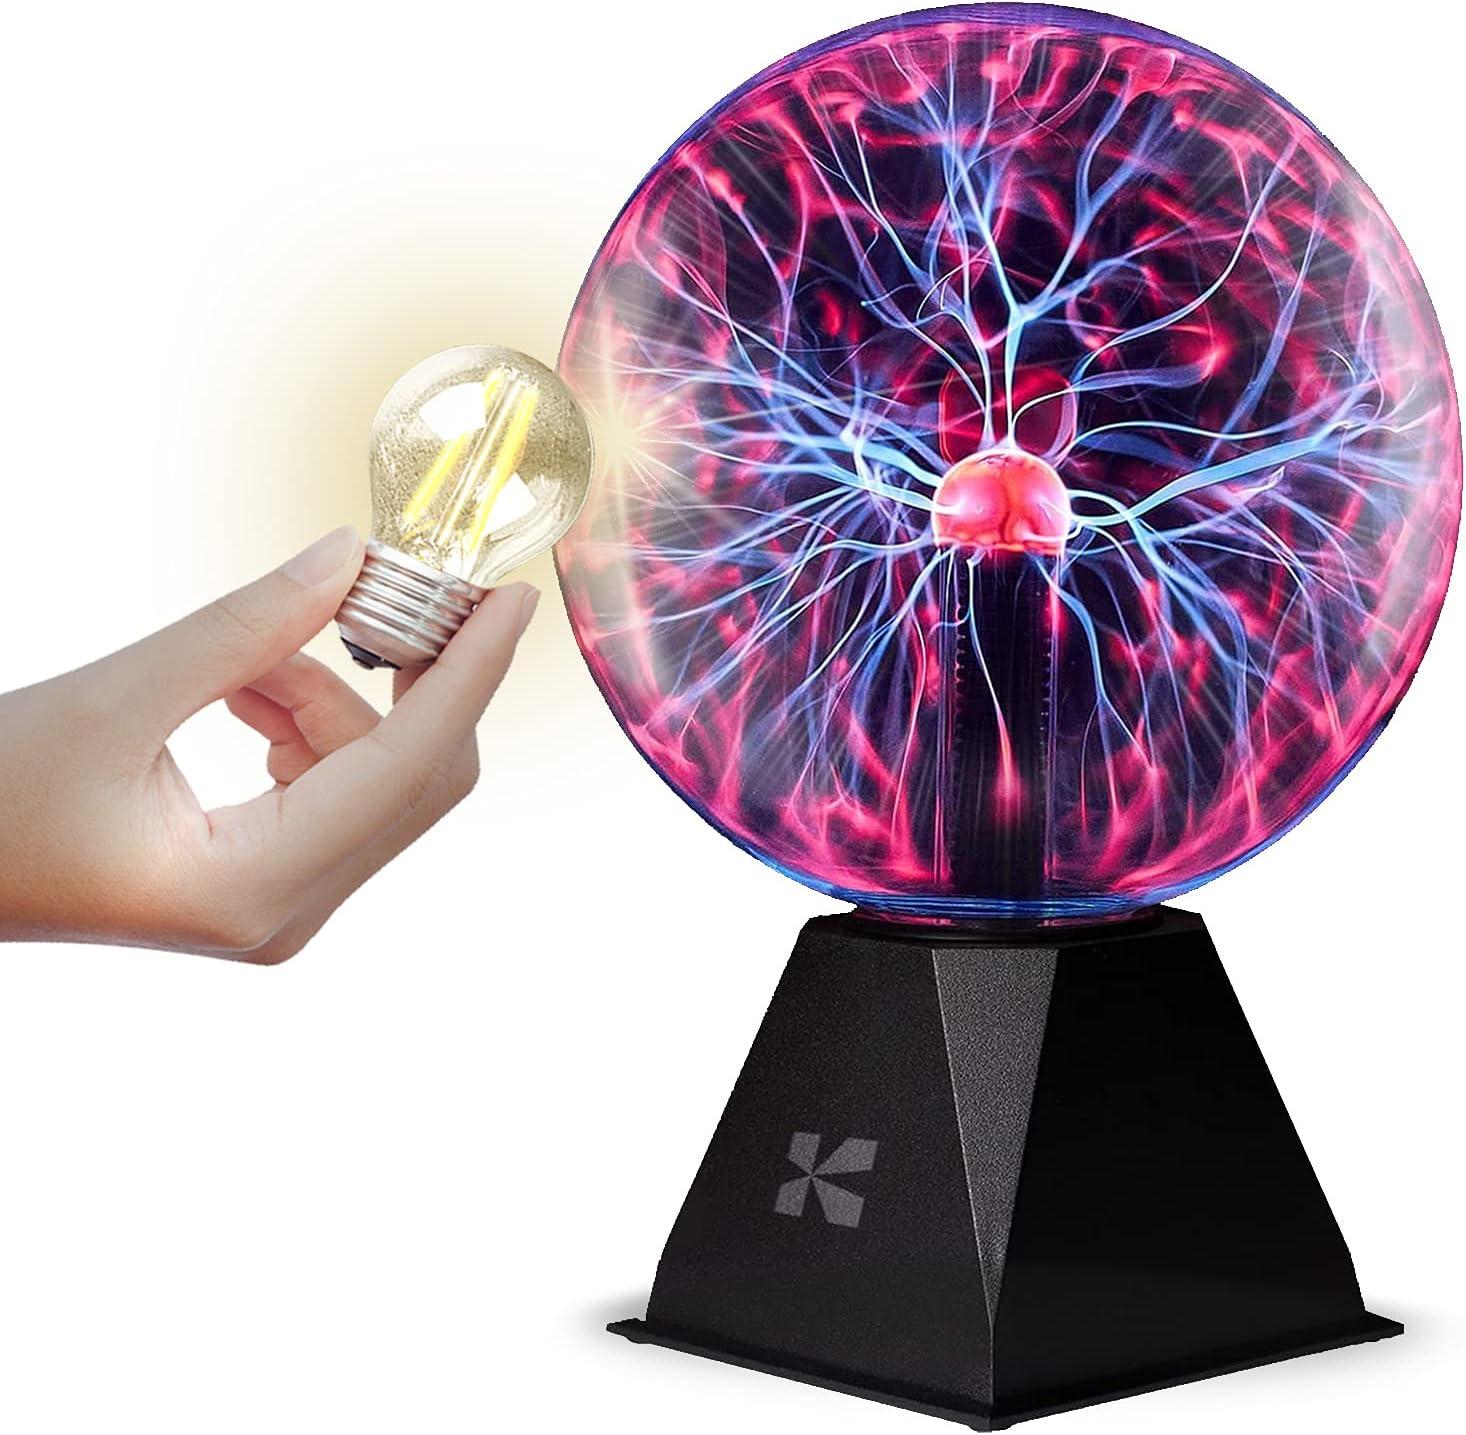 Katzco Plasma Ball - Scientific Set Sacramento Rare Mall Bul Lightning with Charged a